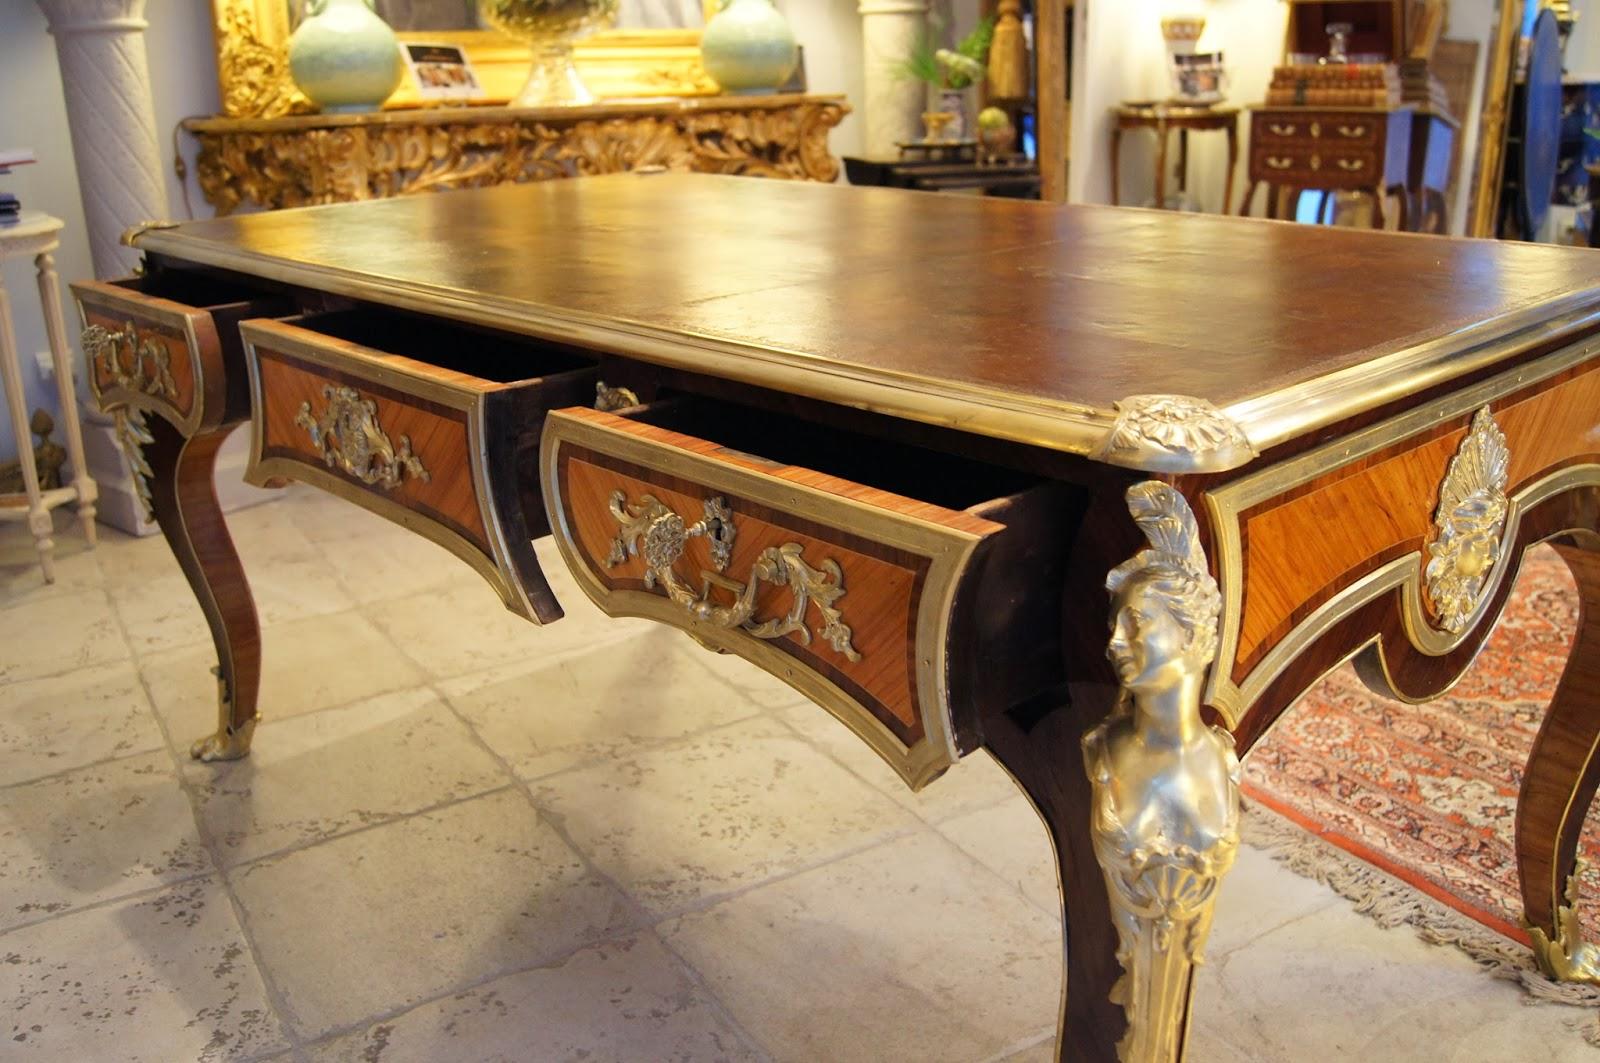 gaubert antiquit s grenoble le bureau plat la cressent. Black Bedroom Furniture Sets. Home Design Ideas